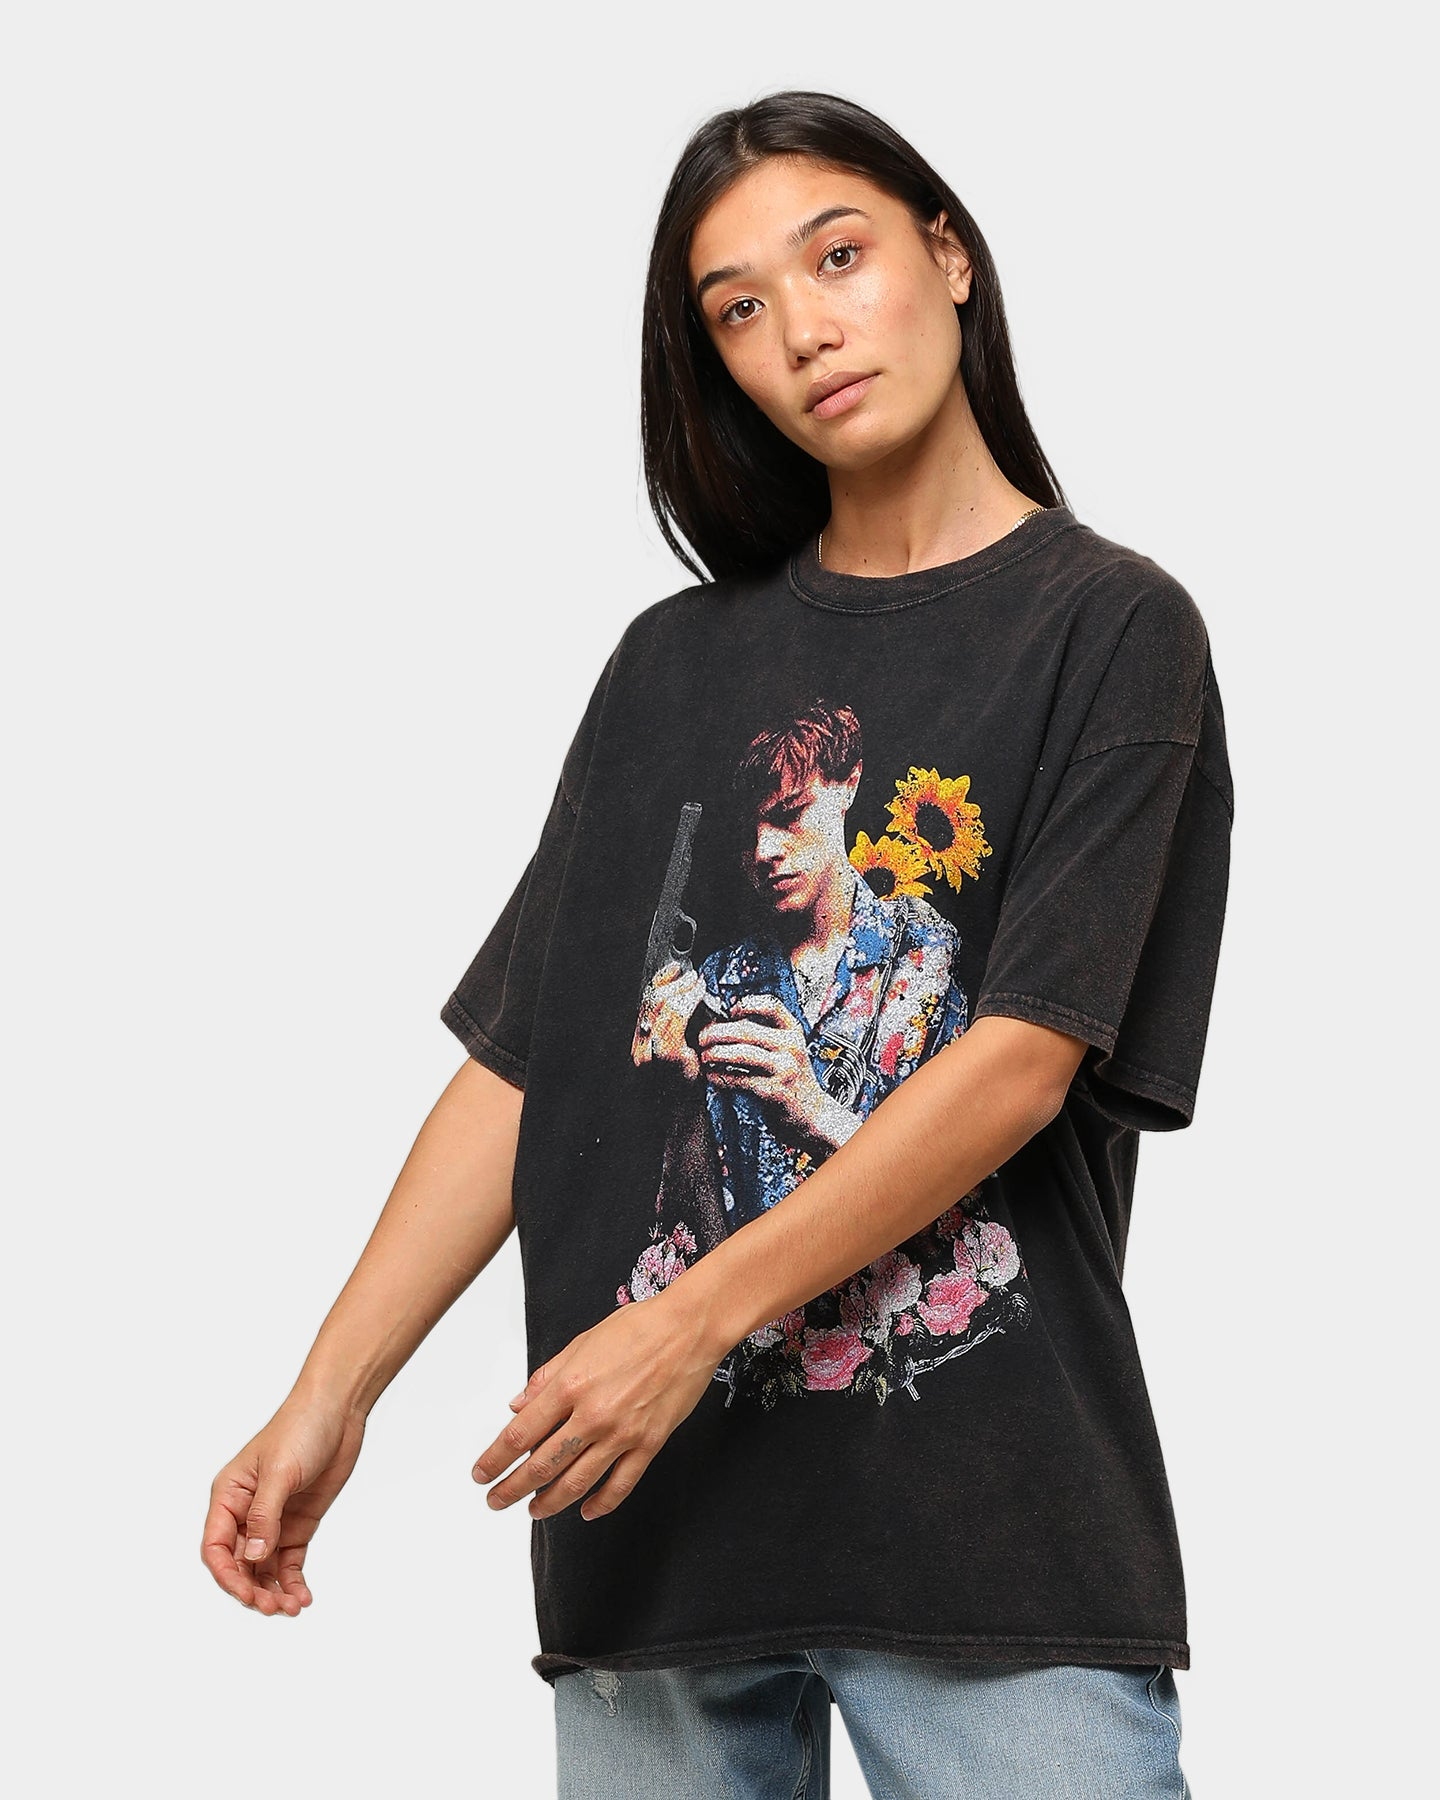 Acid Rap Youth Men Pop Short Sleeves T Shirt Tees Black Cotton